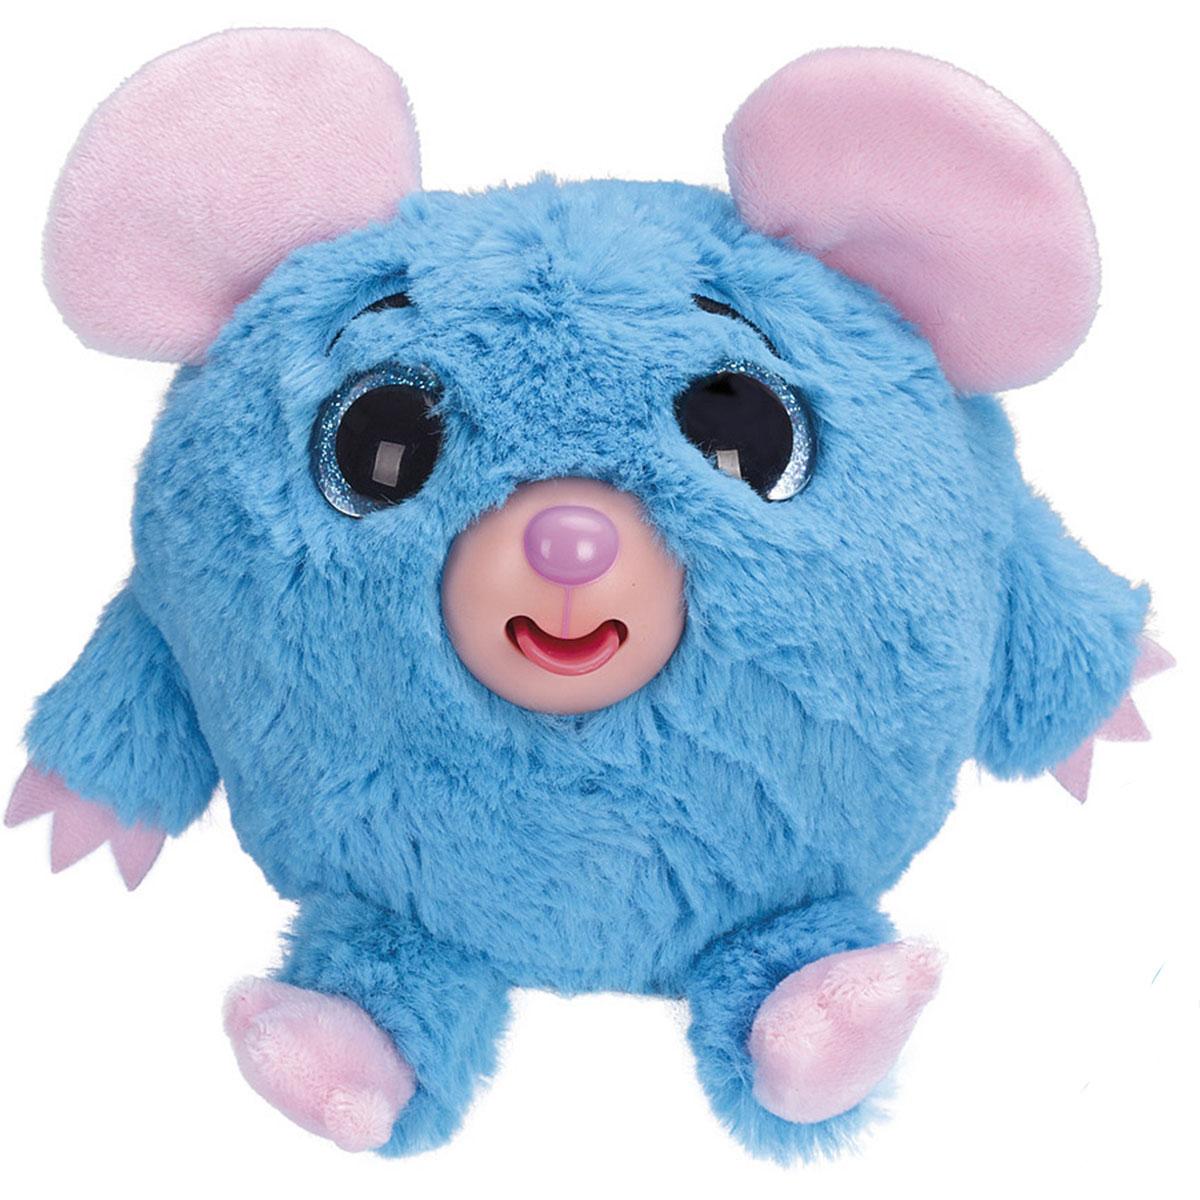 1TOY Мягкая озвученная игрушка Дразнюка-Zooка Мышка 13 см 1toyмягкая озвученная игрушка дразнюка zoo лисичка 13 см